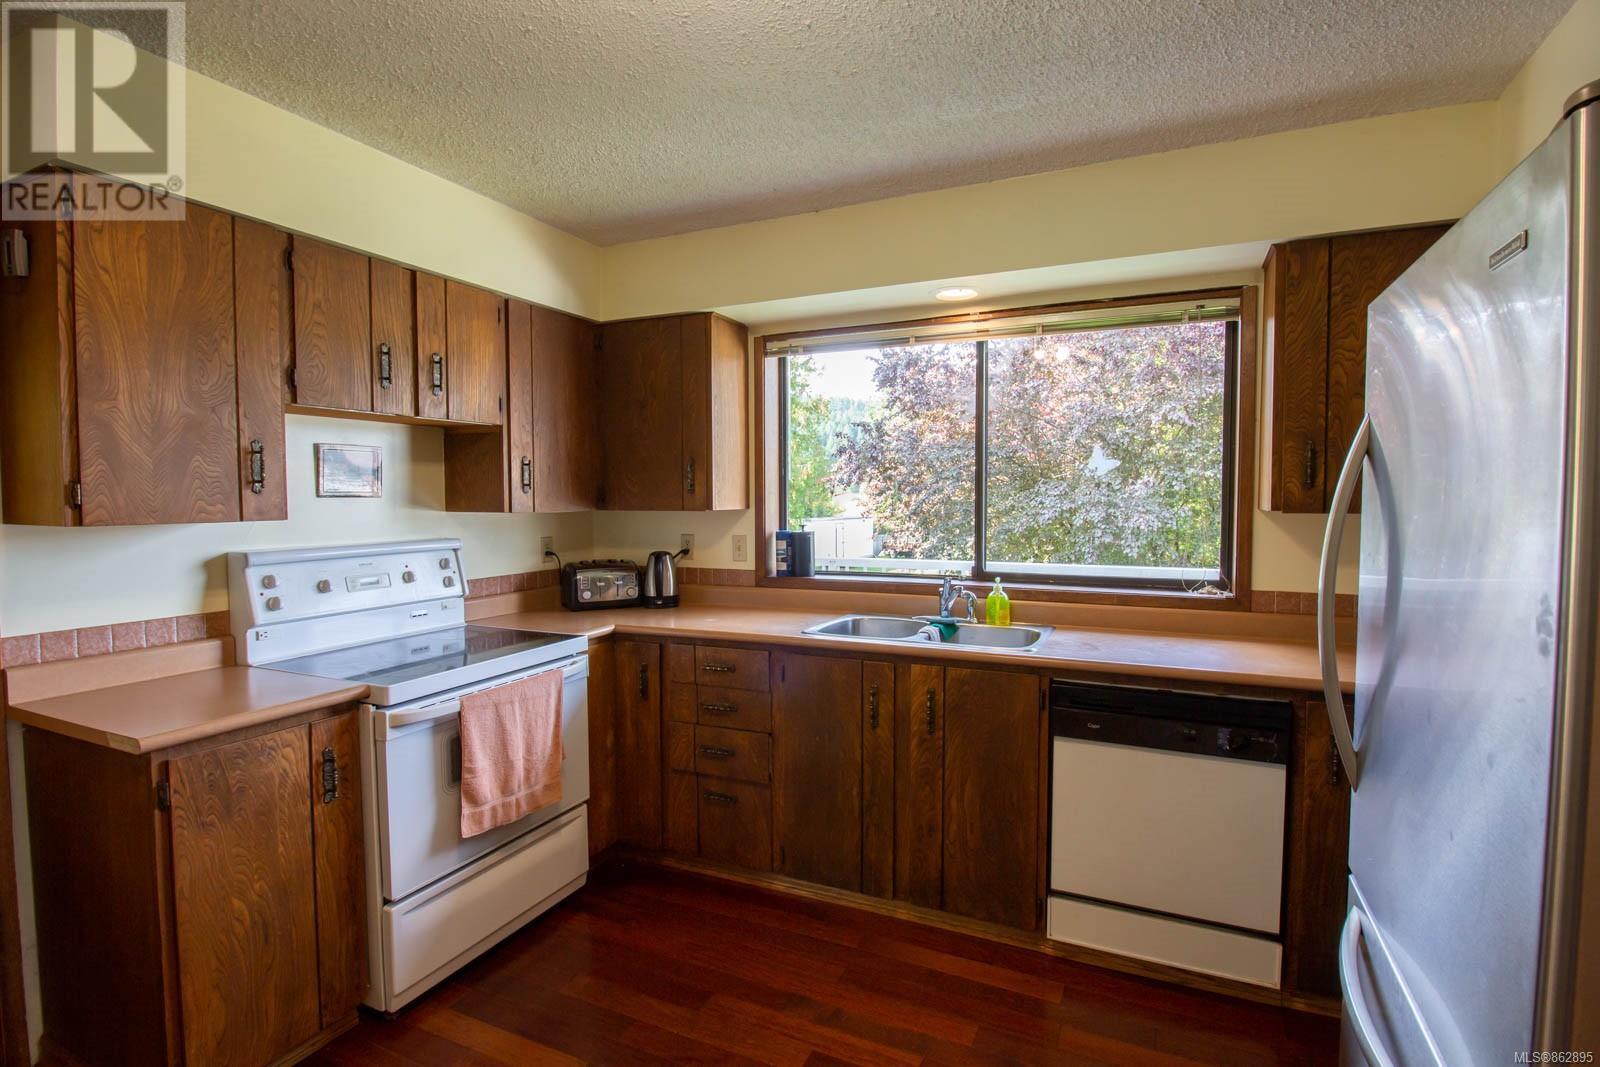 6690 Jenkins Rd, Nanaimo, British Columbia  V9T 6G8 - Photo 6 - 862895